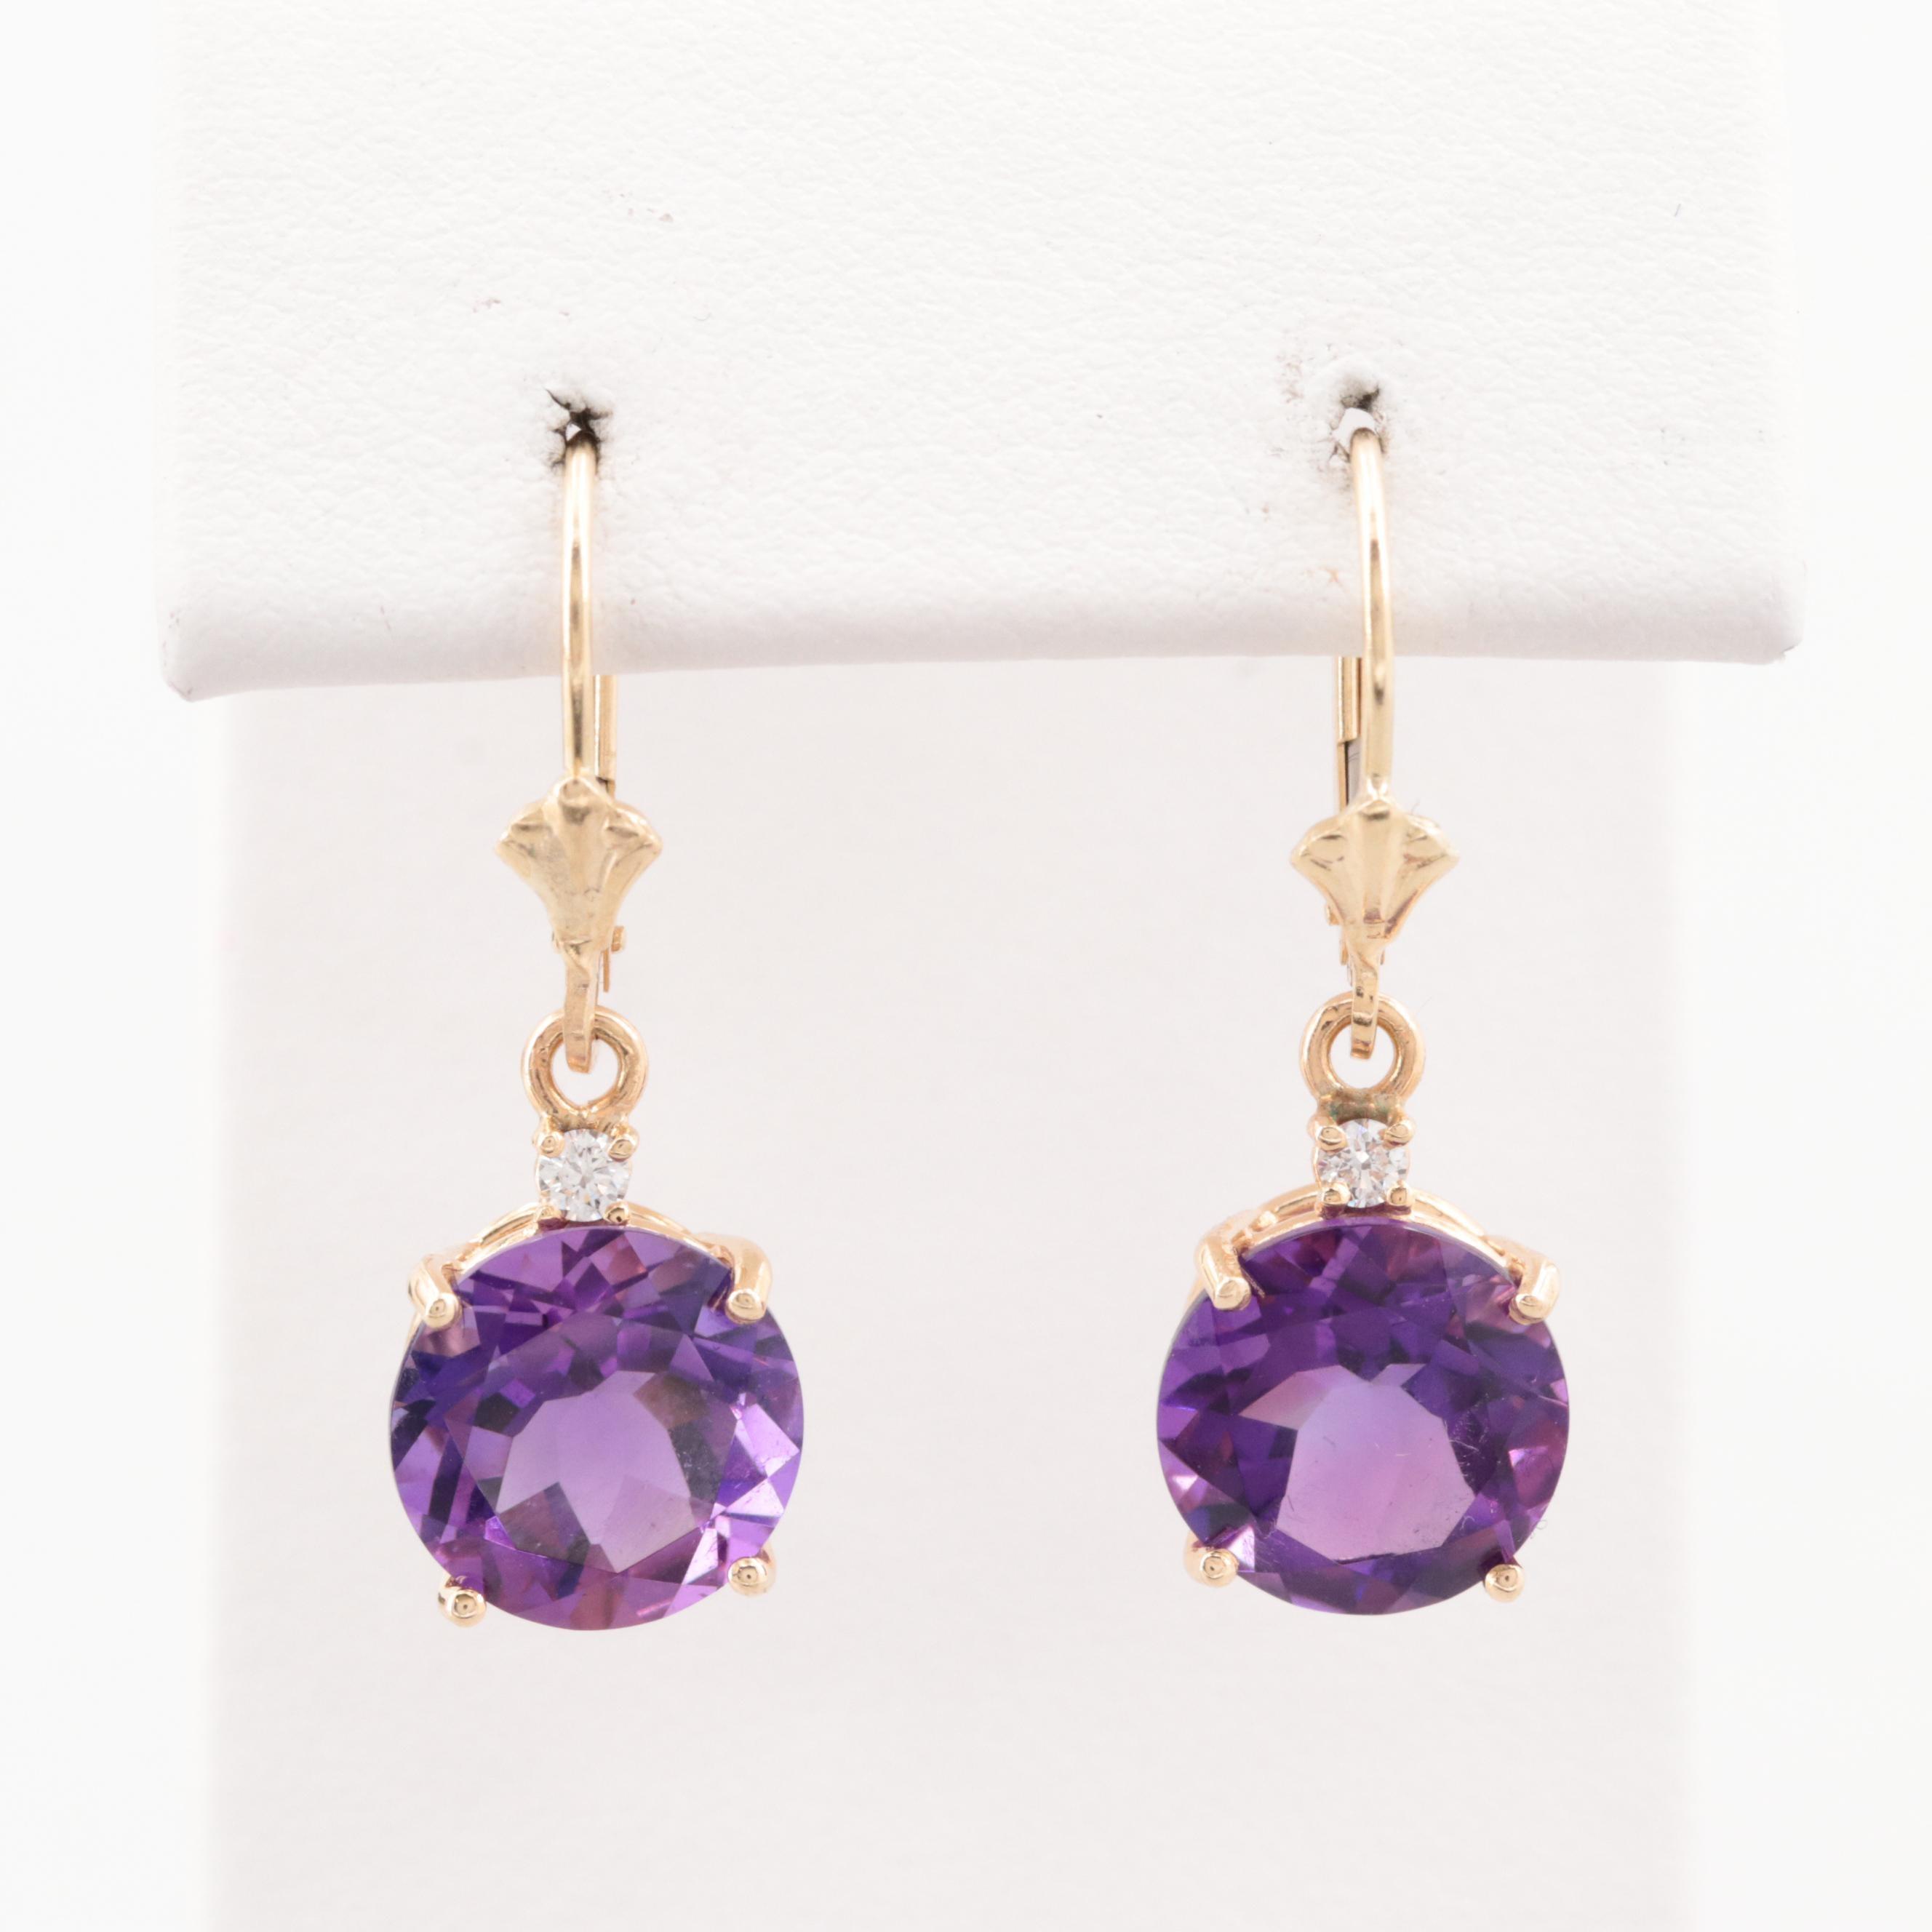 14K Yellow Gold Amethyst and Diamond Dangle Earrings